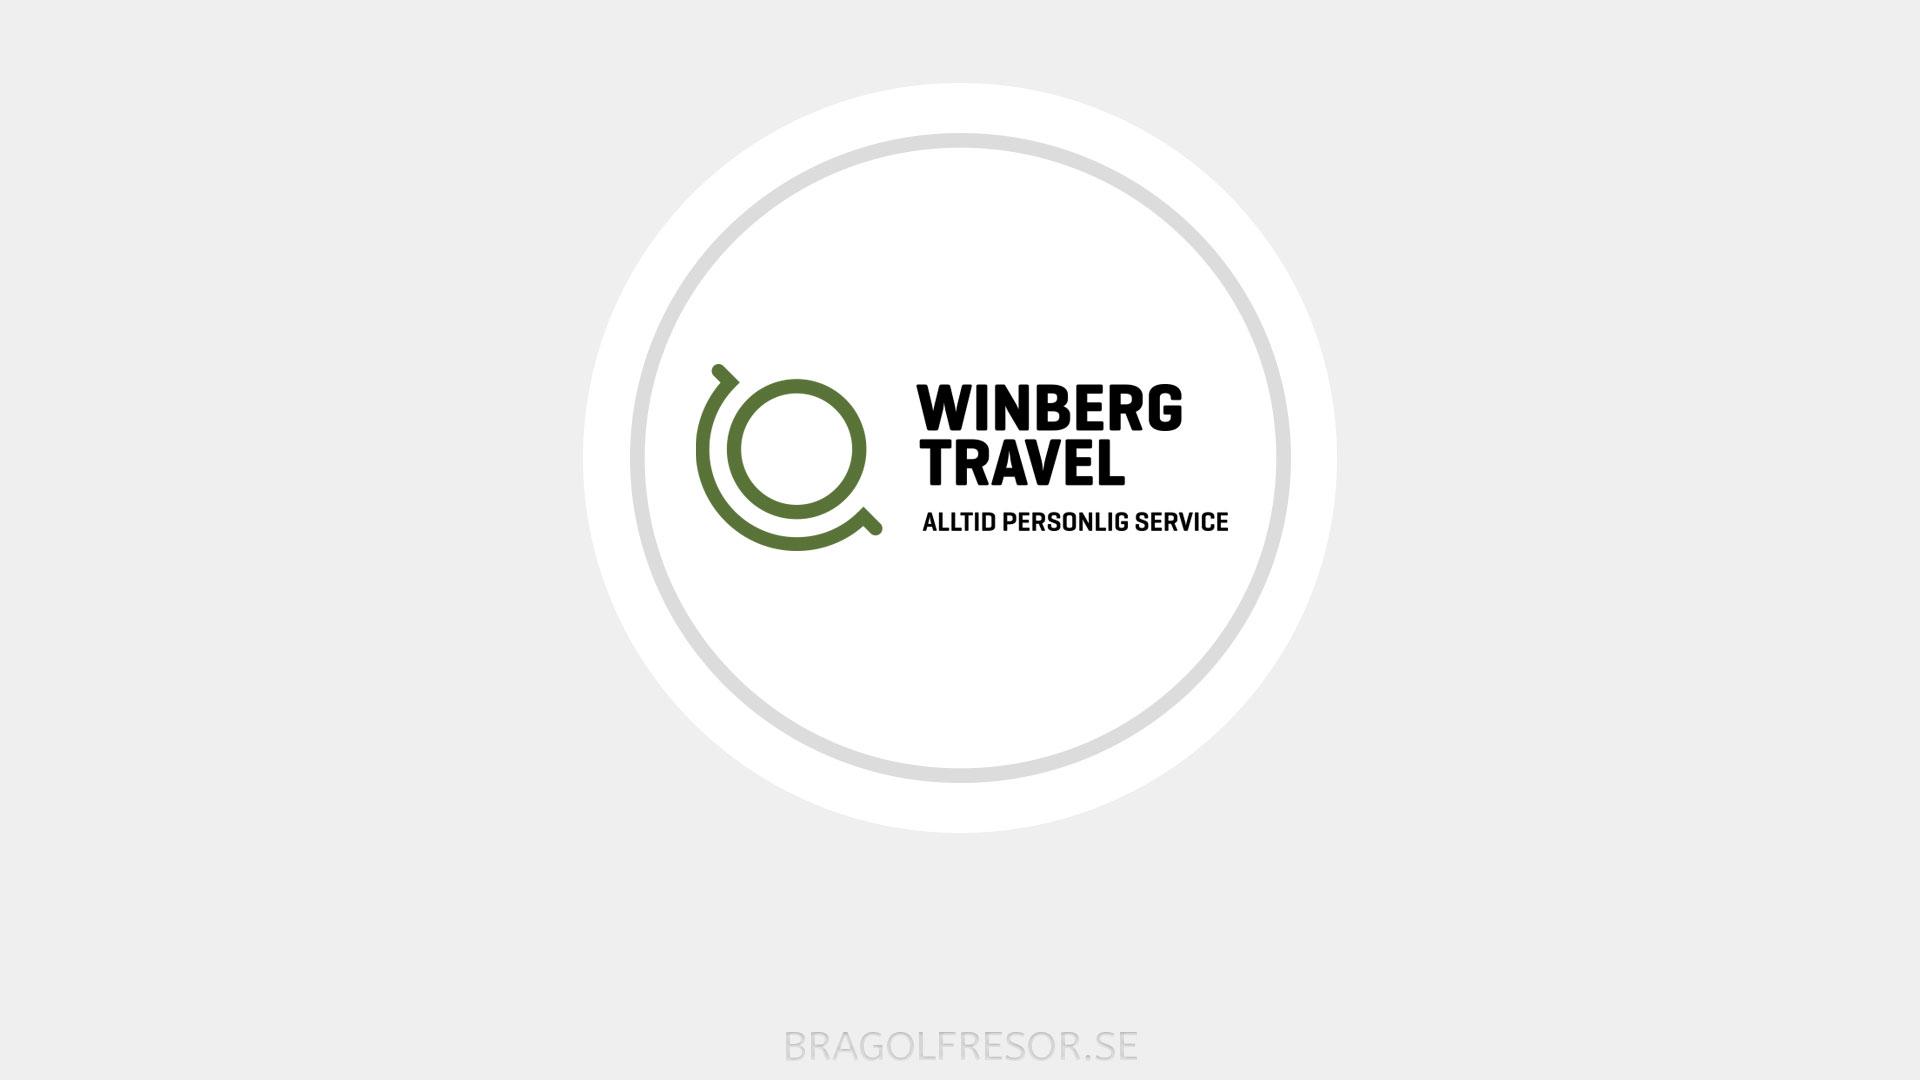 Winberg Travel